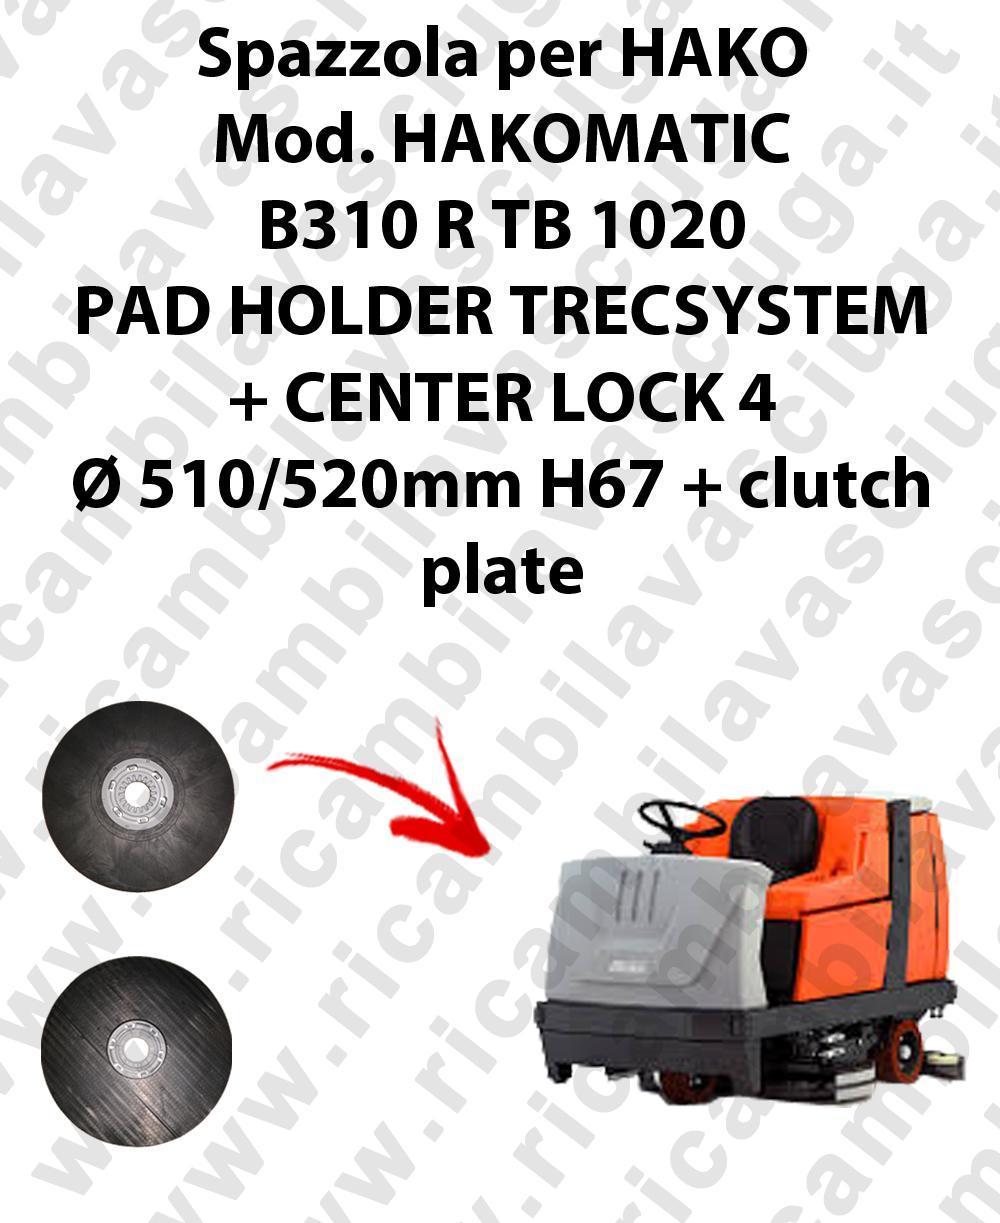 PAD HOLDER TRECSYSTEM  pour autolaveuses HAKO Reference HAKOMATIC B310 R TB 1020